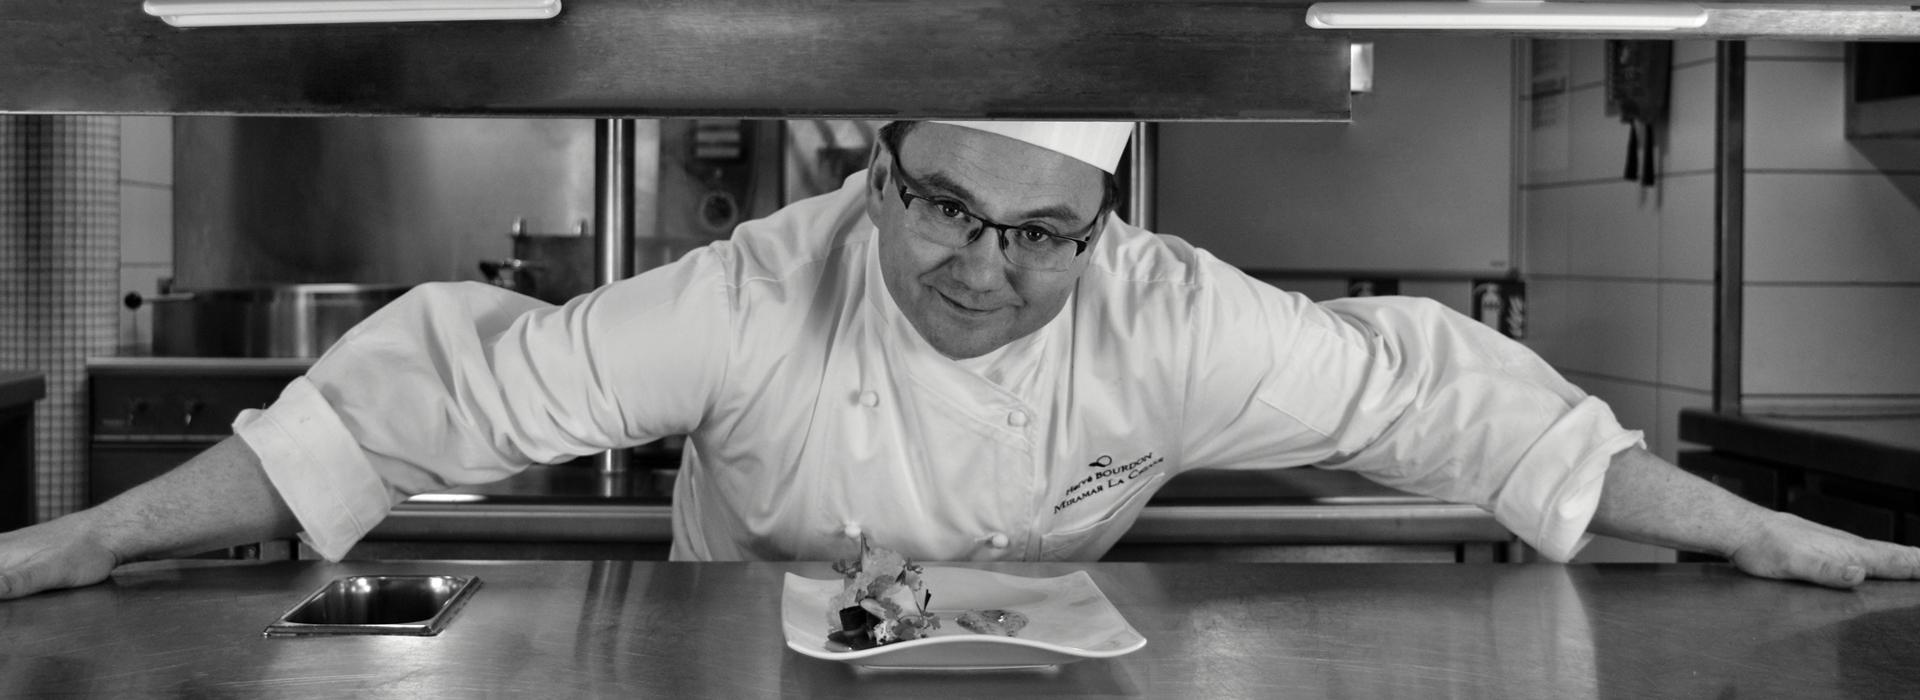 Chef hervé bourdon